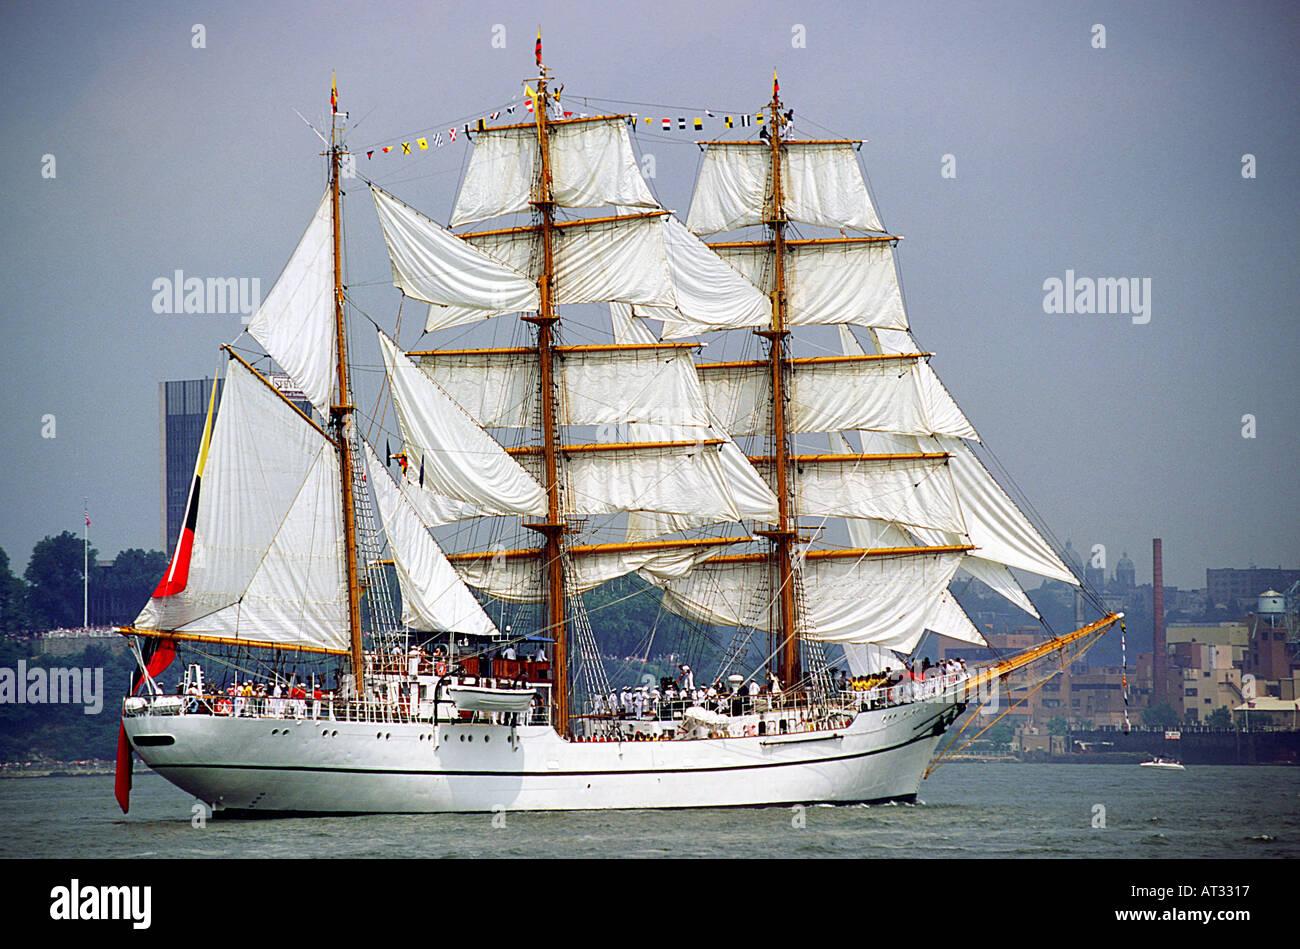 Tall Ship Columbian Bark Gloria New York City Hudson River - Stock Image